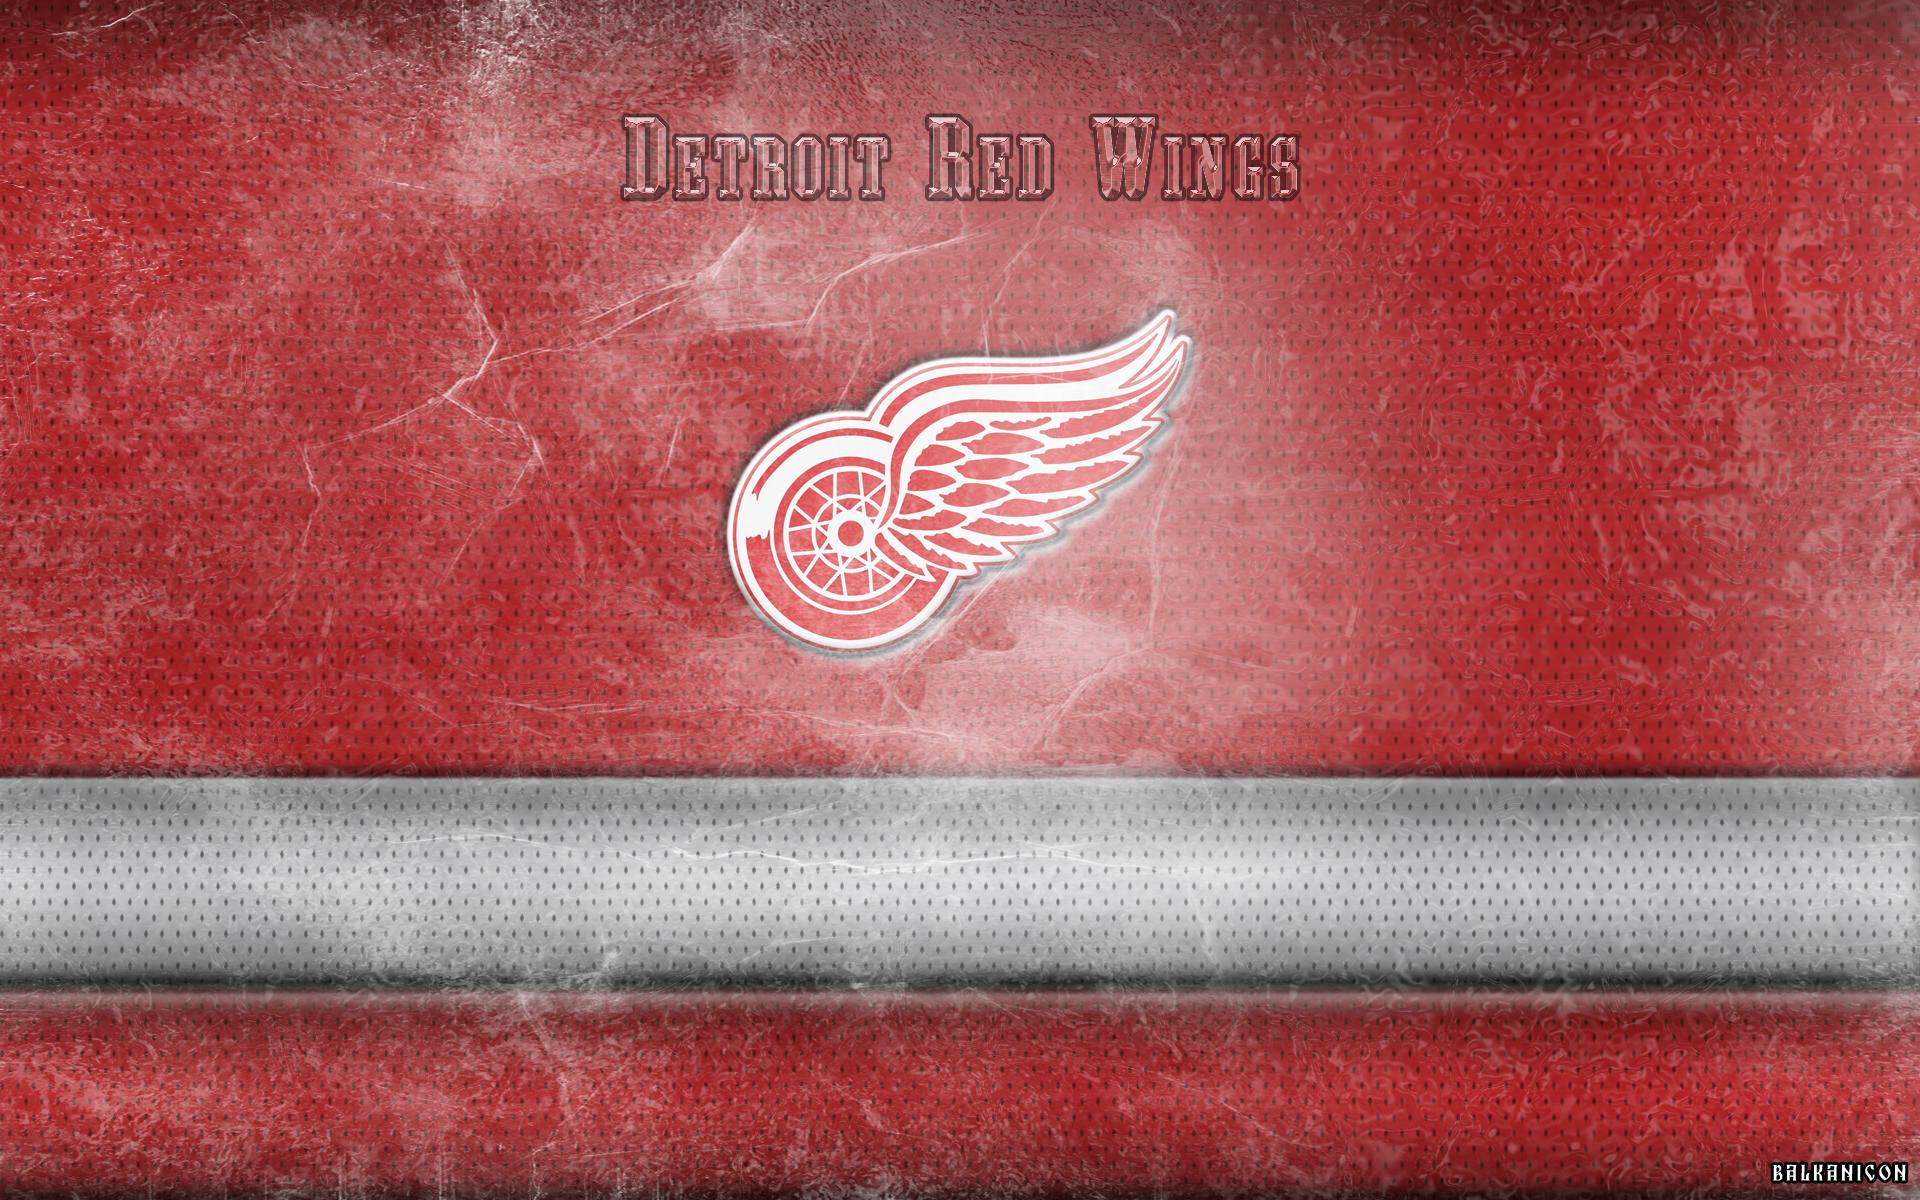 Detroit Red Wings wallpaper by Balkanicon 1920x1200